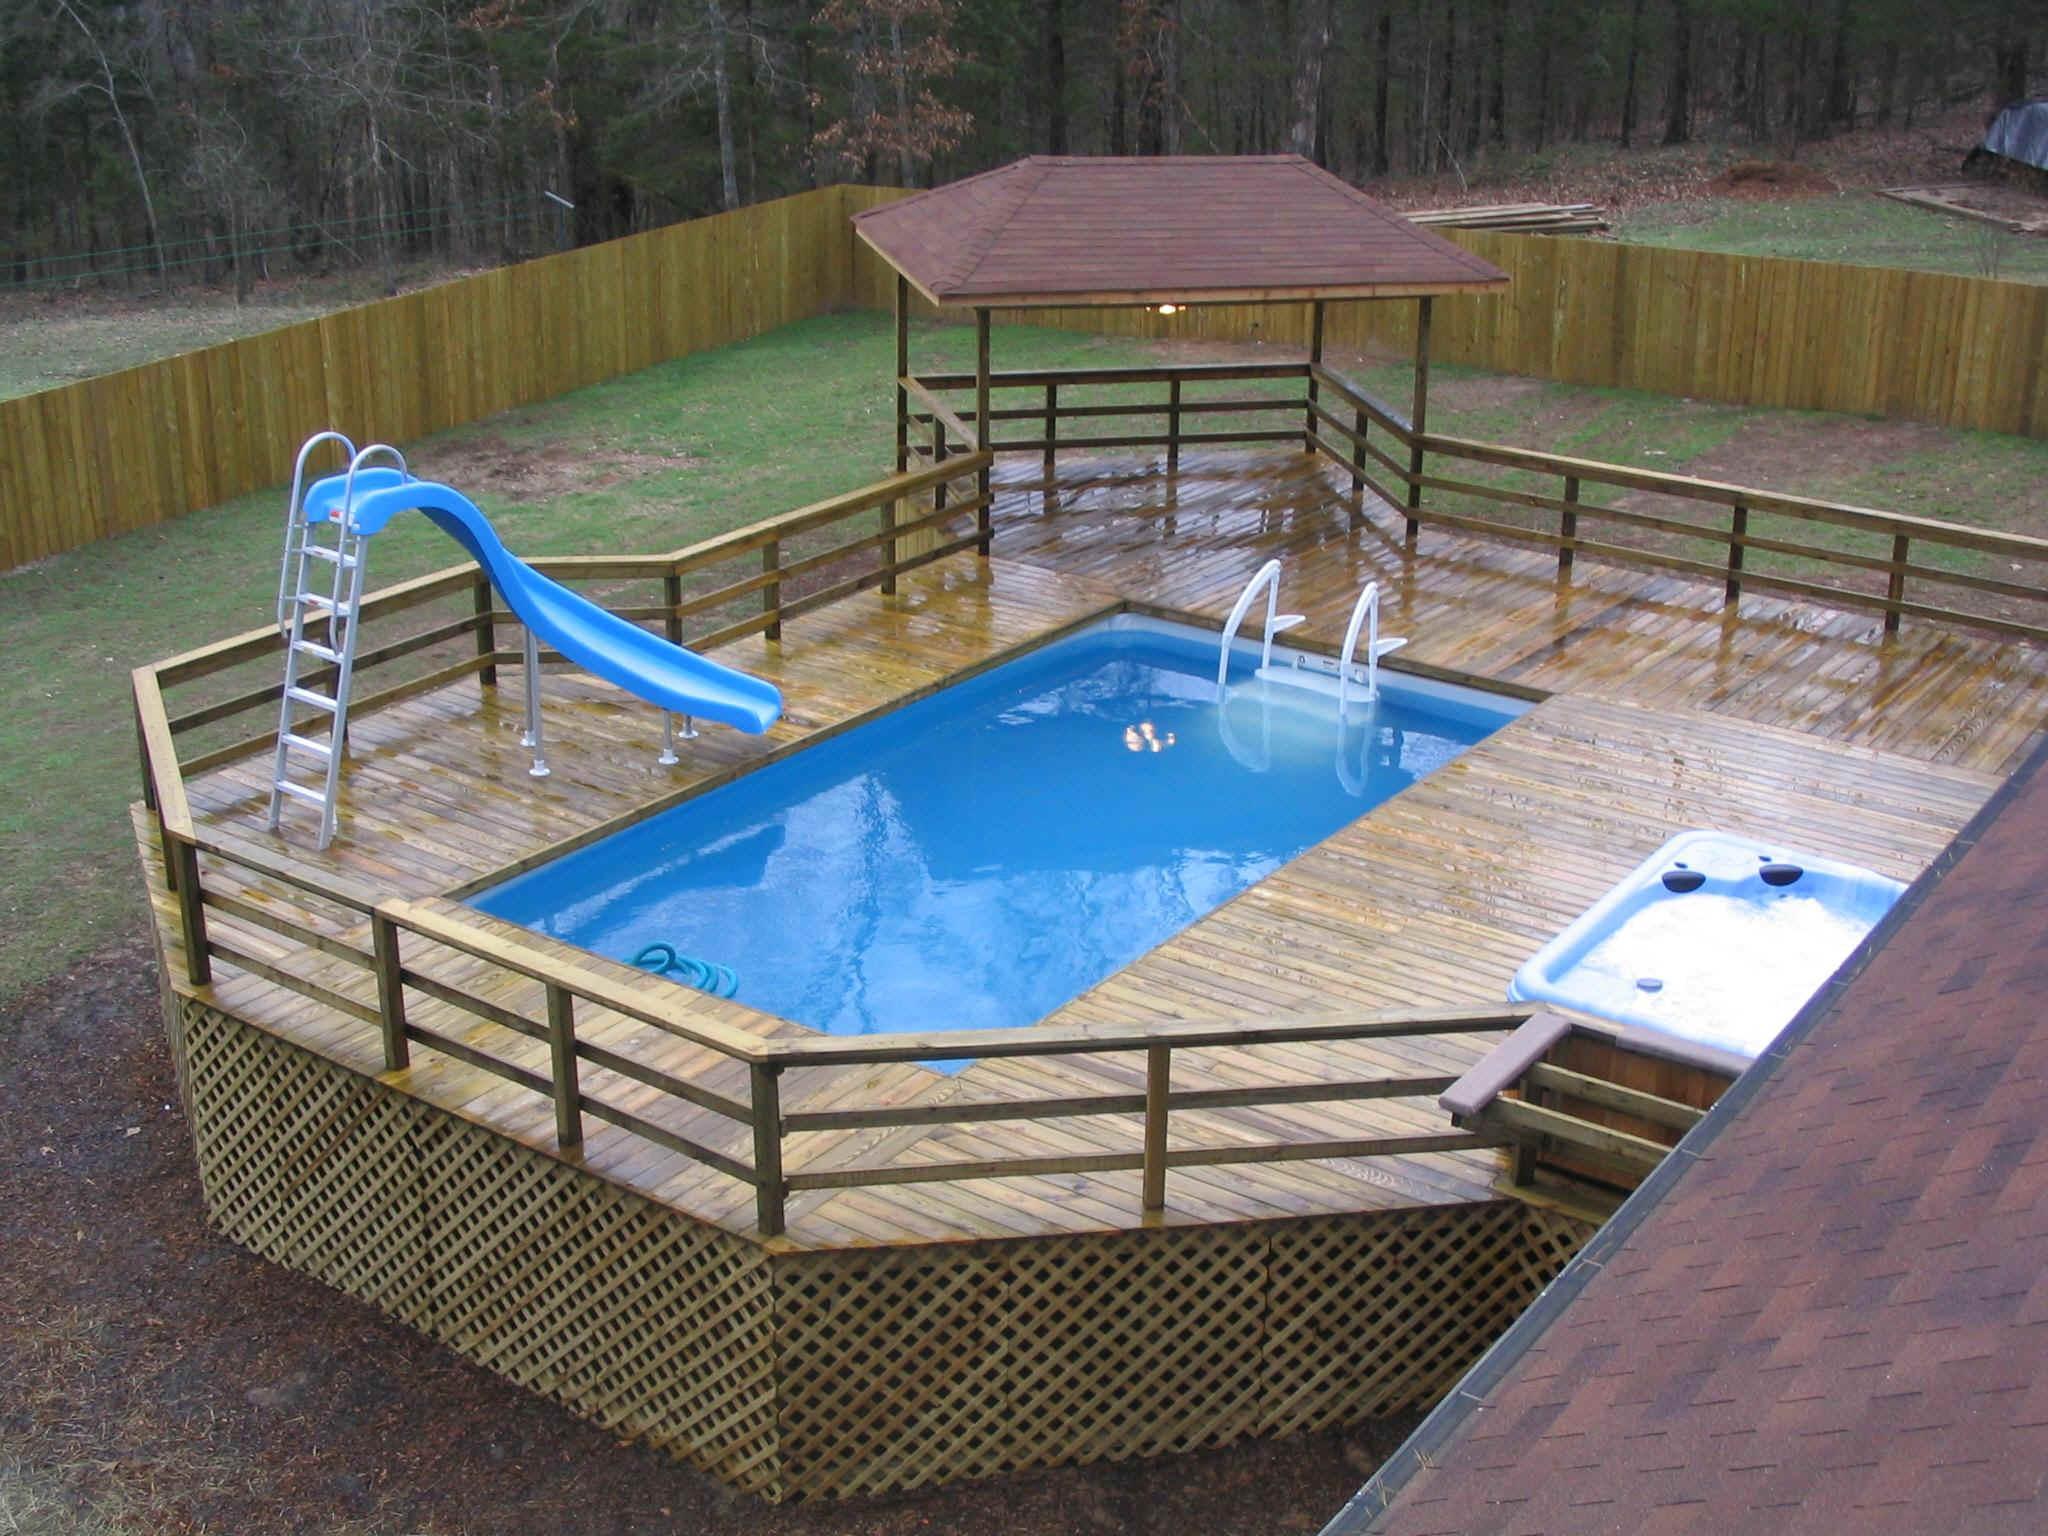 42 Above Ground Pools with Decks - Tips, Ideas & Design ... on Patio Ideas Around Pool id=80547